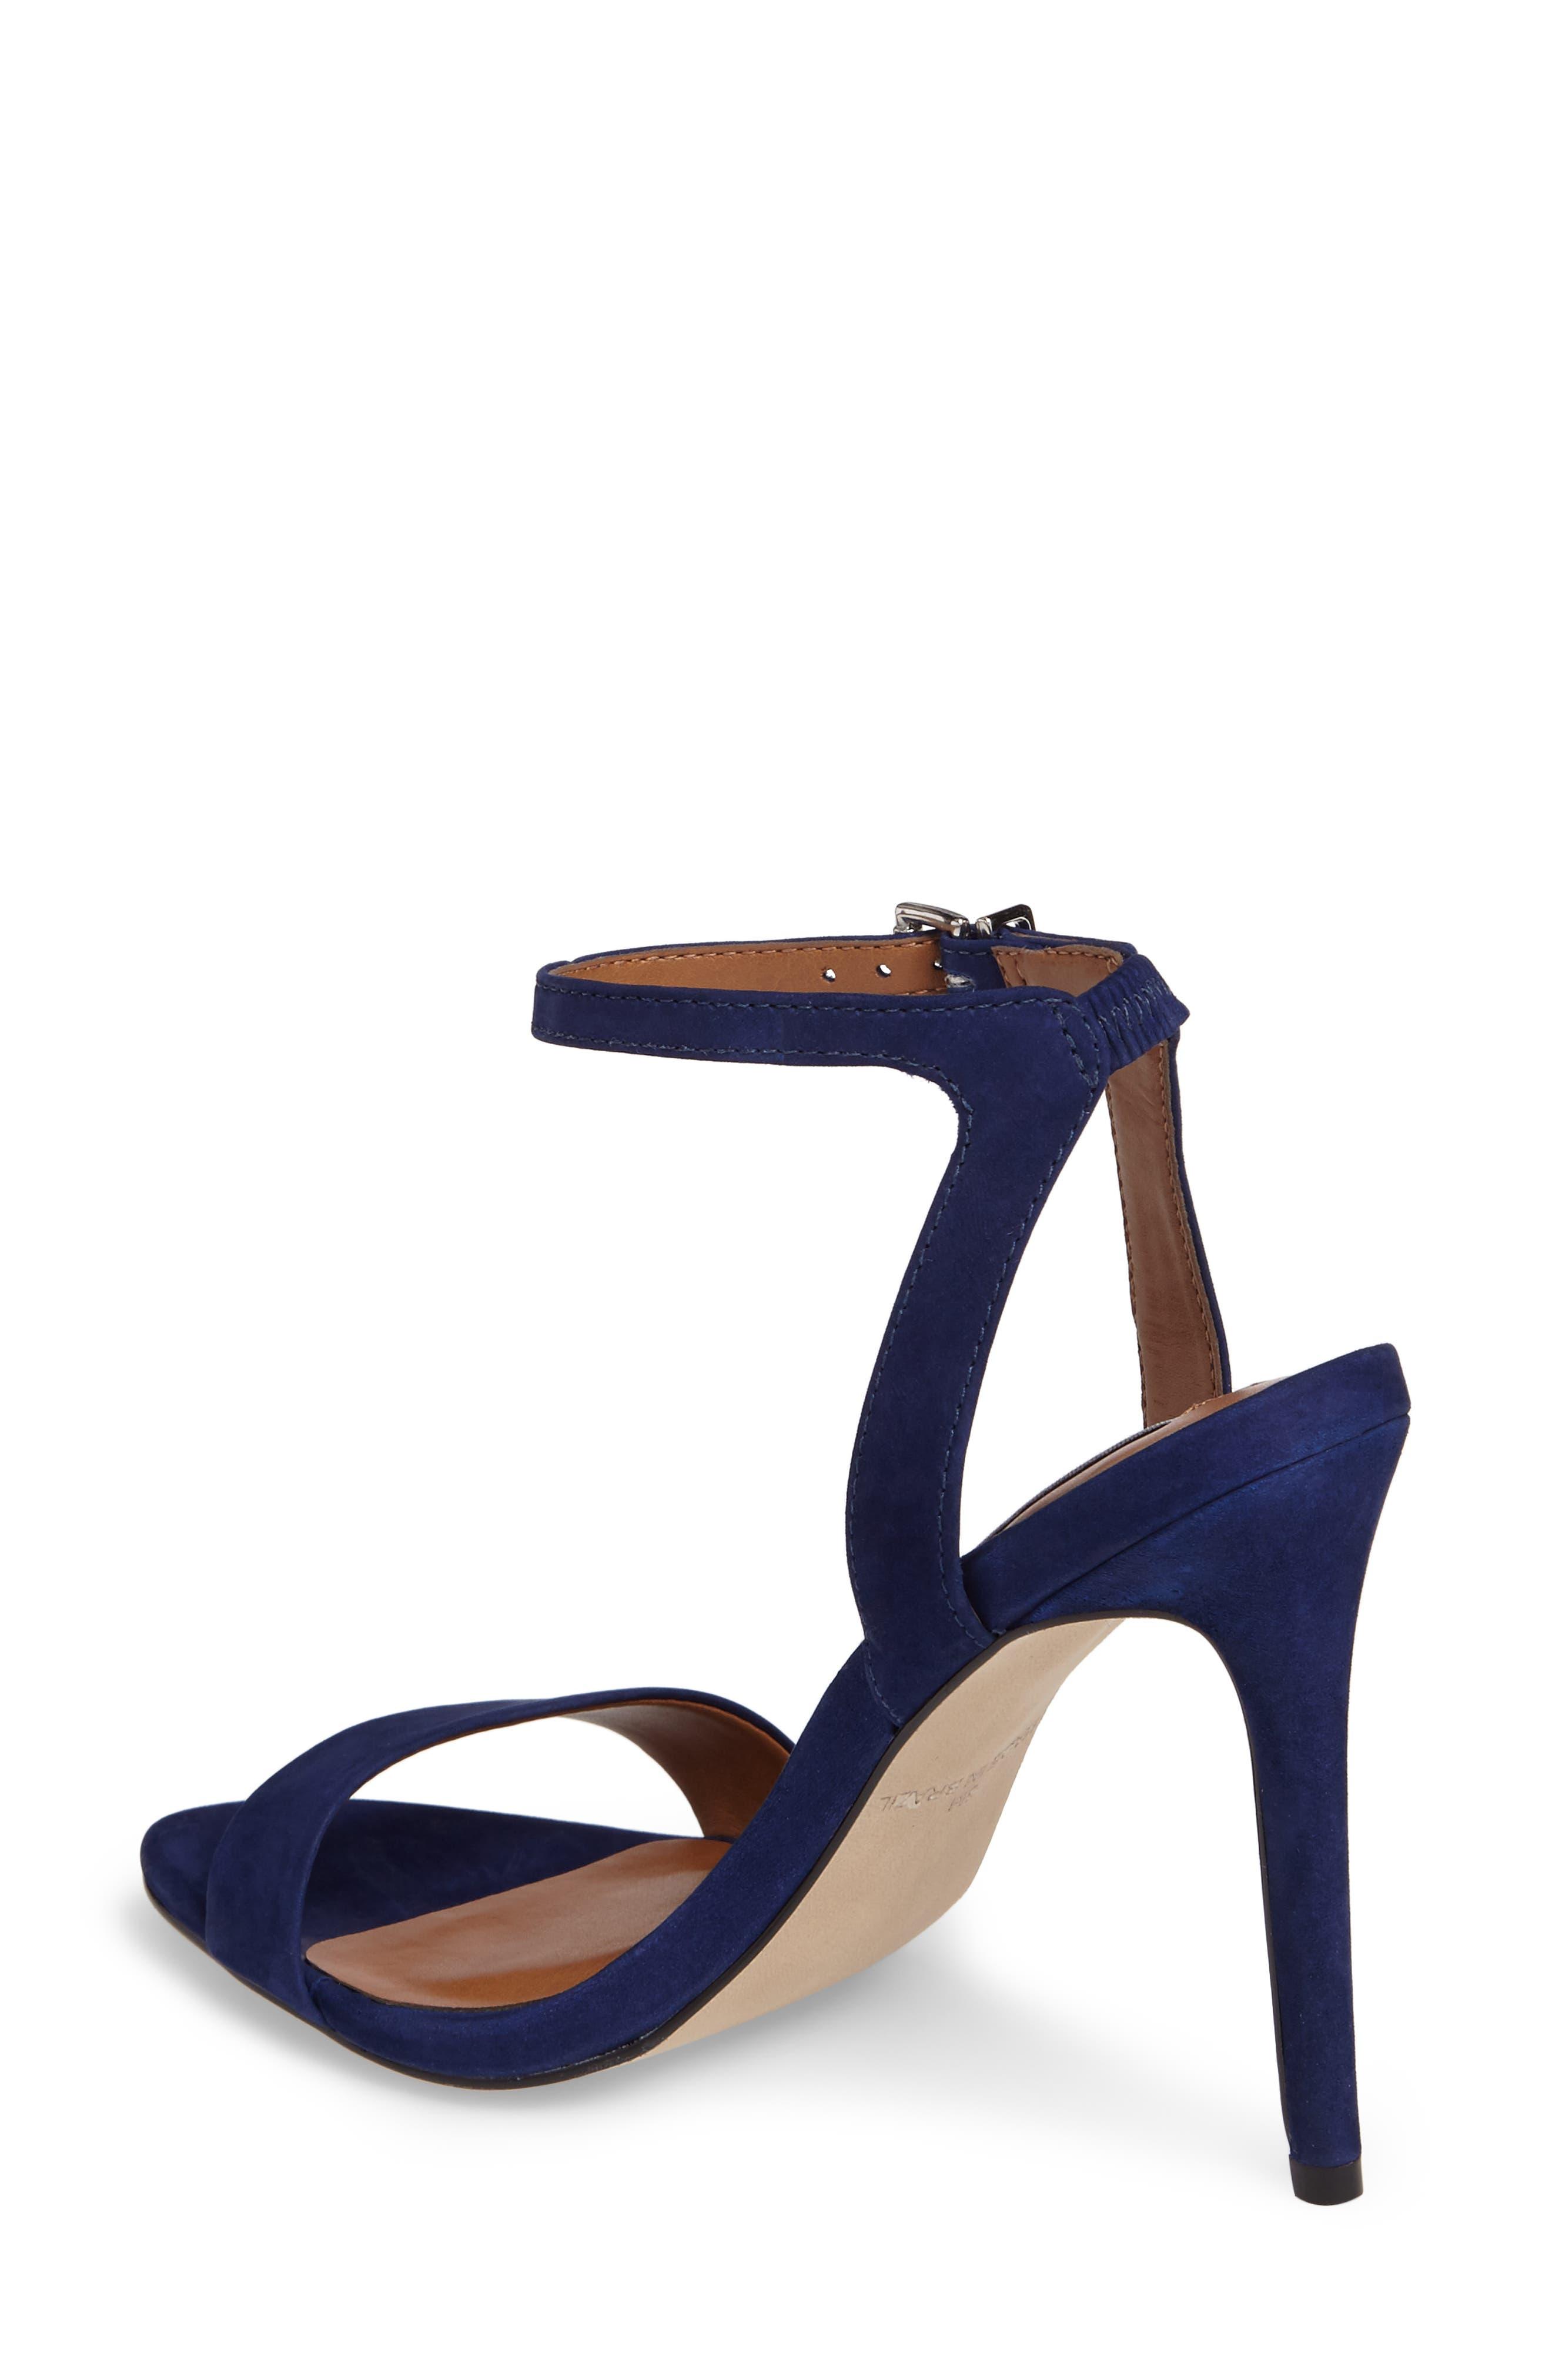 Landen Ankle Strap Sandal,                             Alternate thumbnail 22, color,